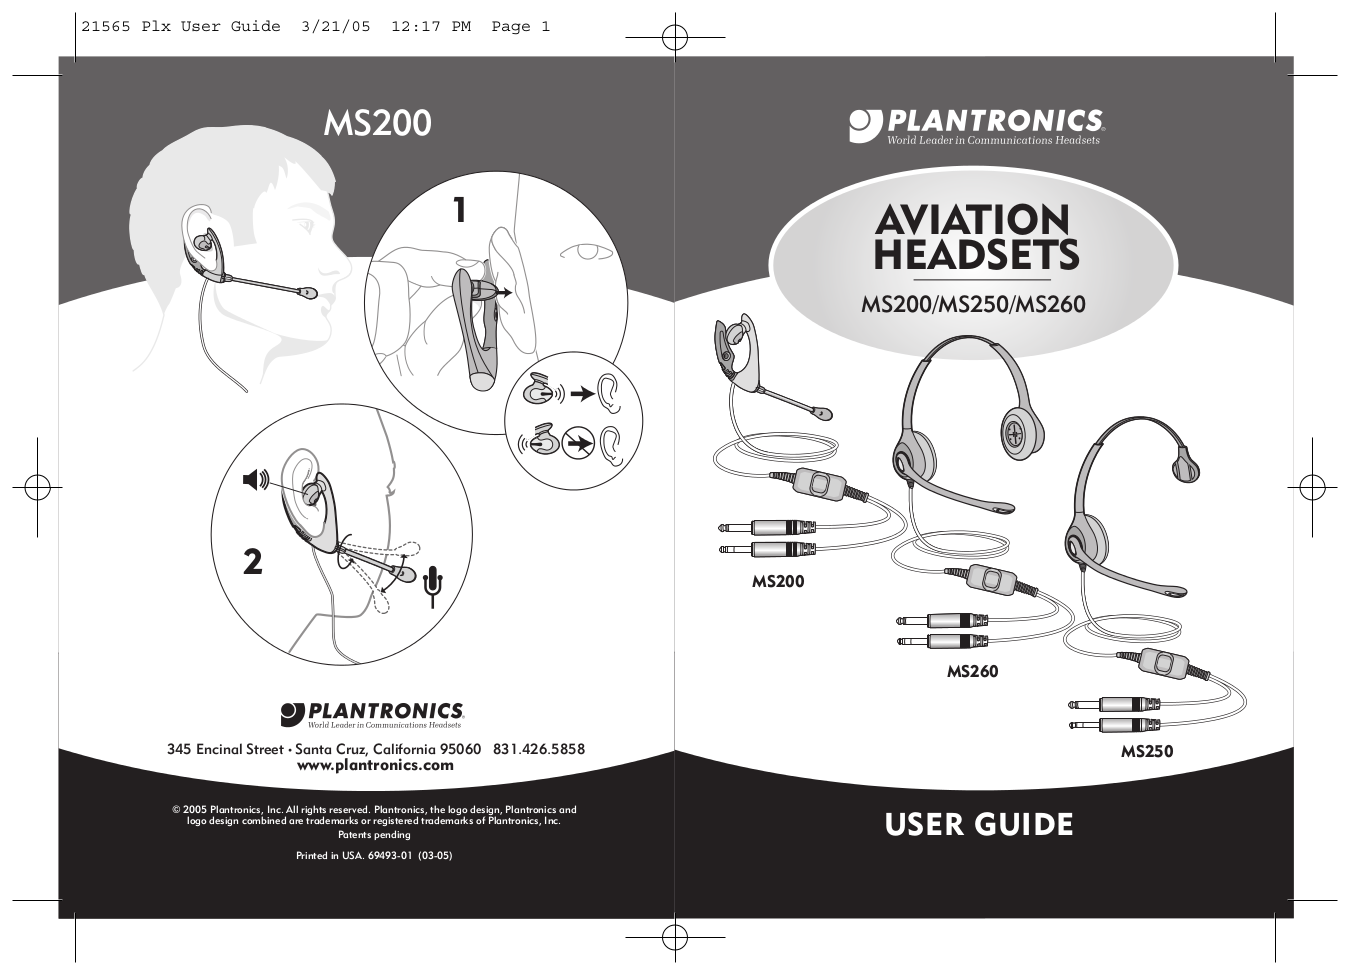 Download Free Pdf For Plantronics Aviation Ms250 Headset Manual